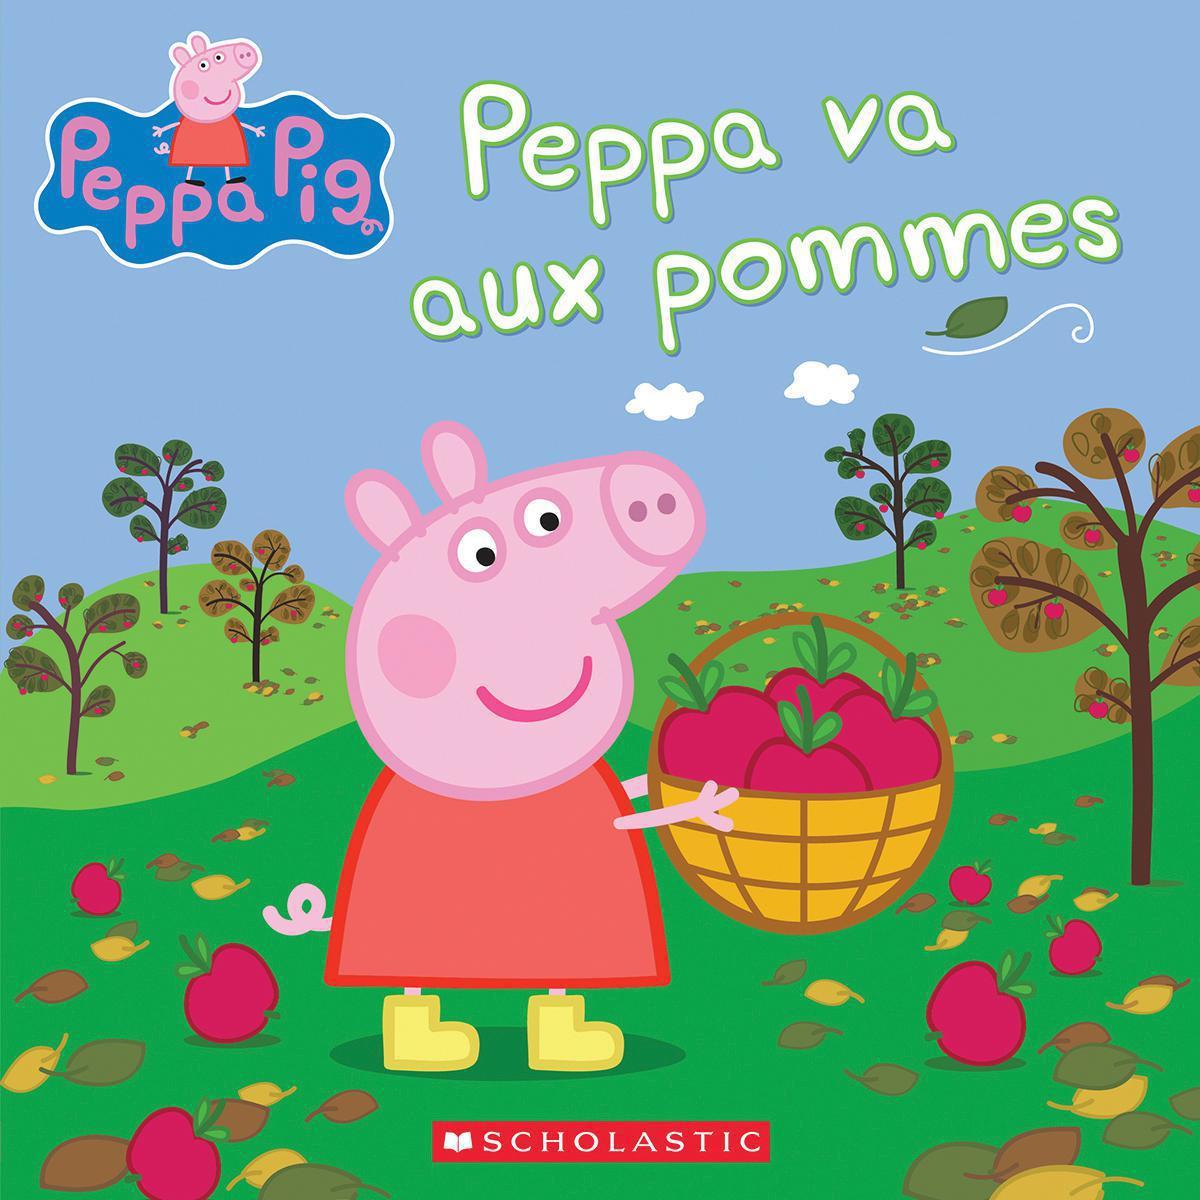 Peppa Pig : Peppa va aux pommes